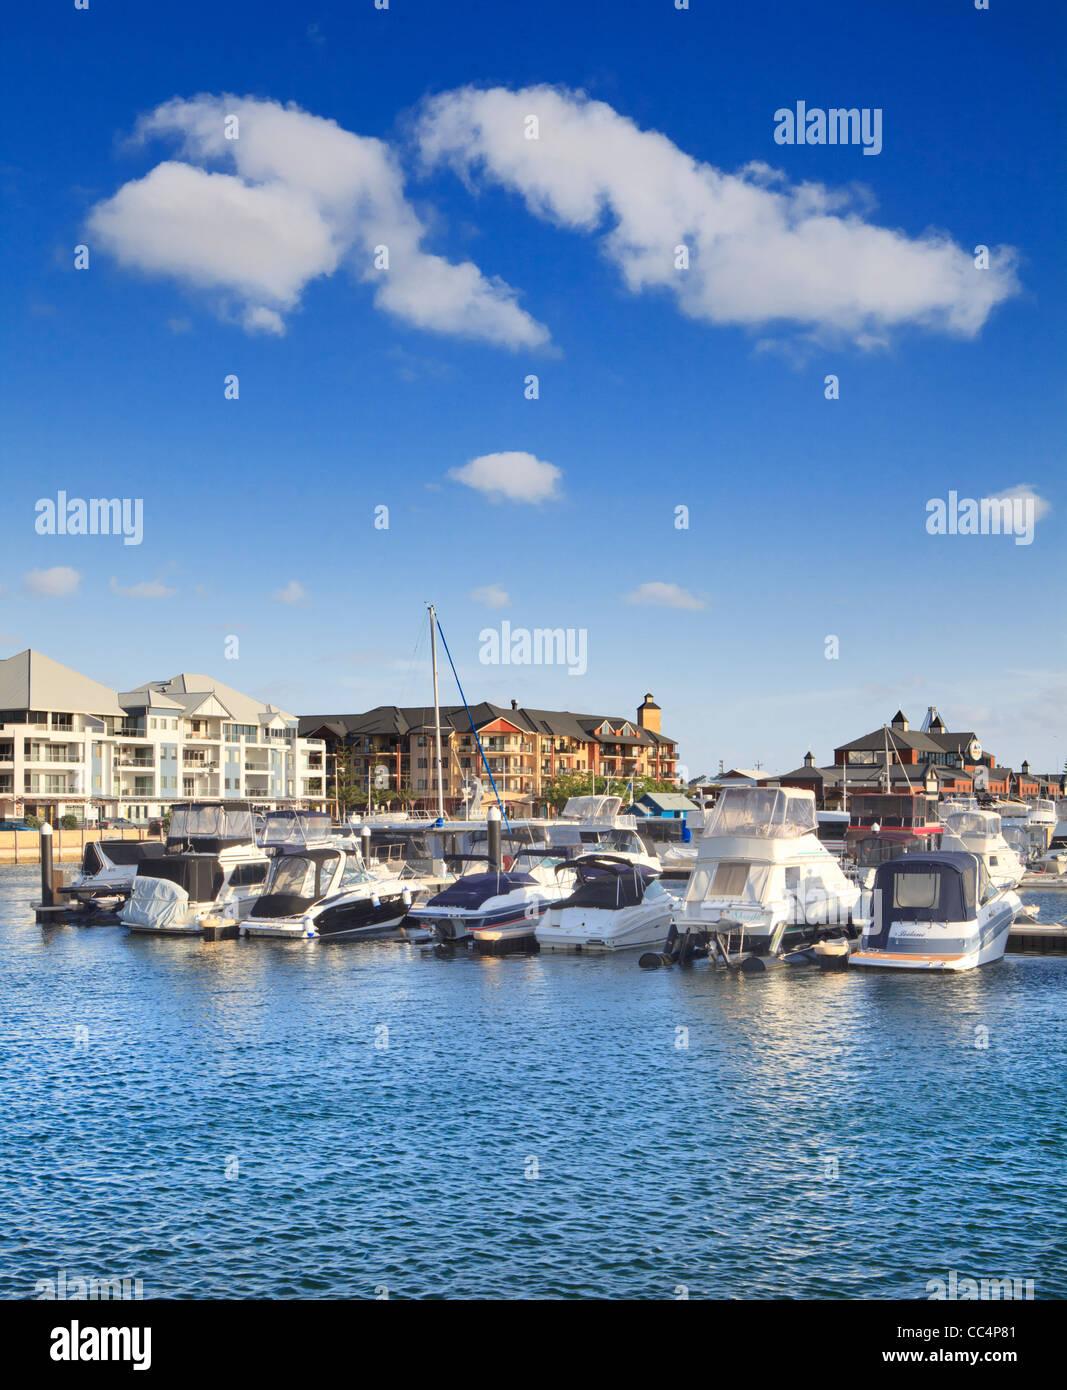 Boats moored at Dolphin Quay Ocean Marina in Mandurah, Western Australia - Stock Image